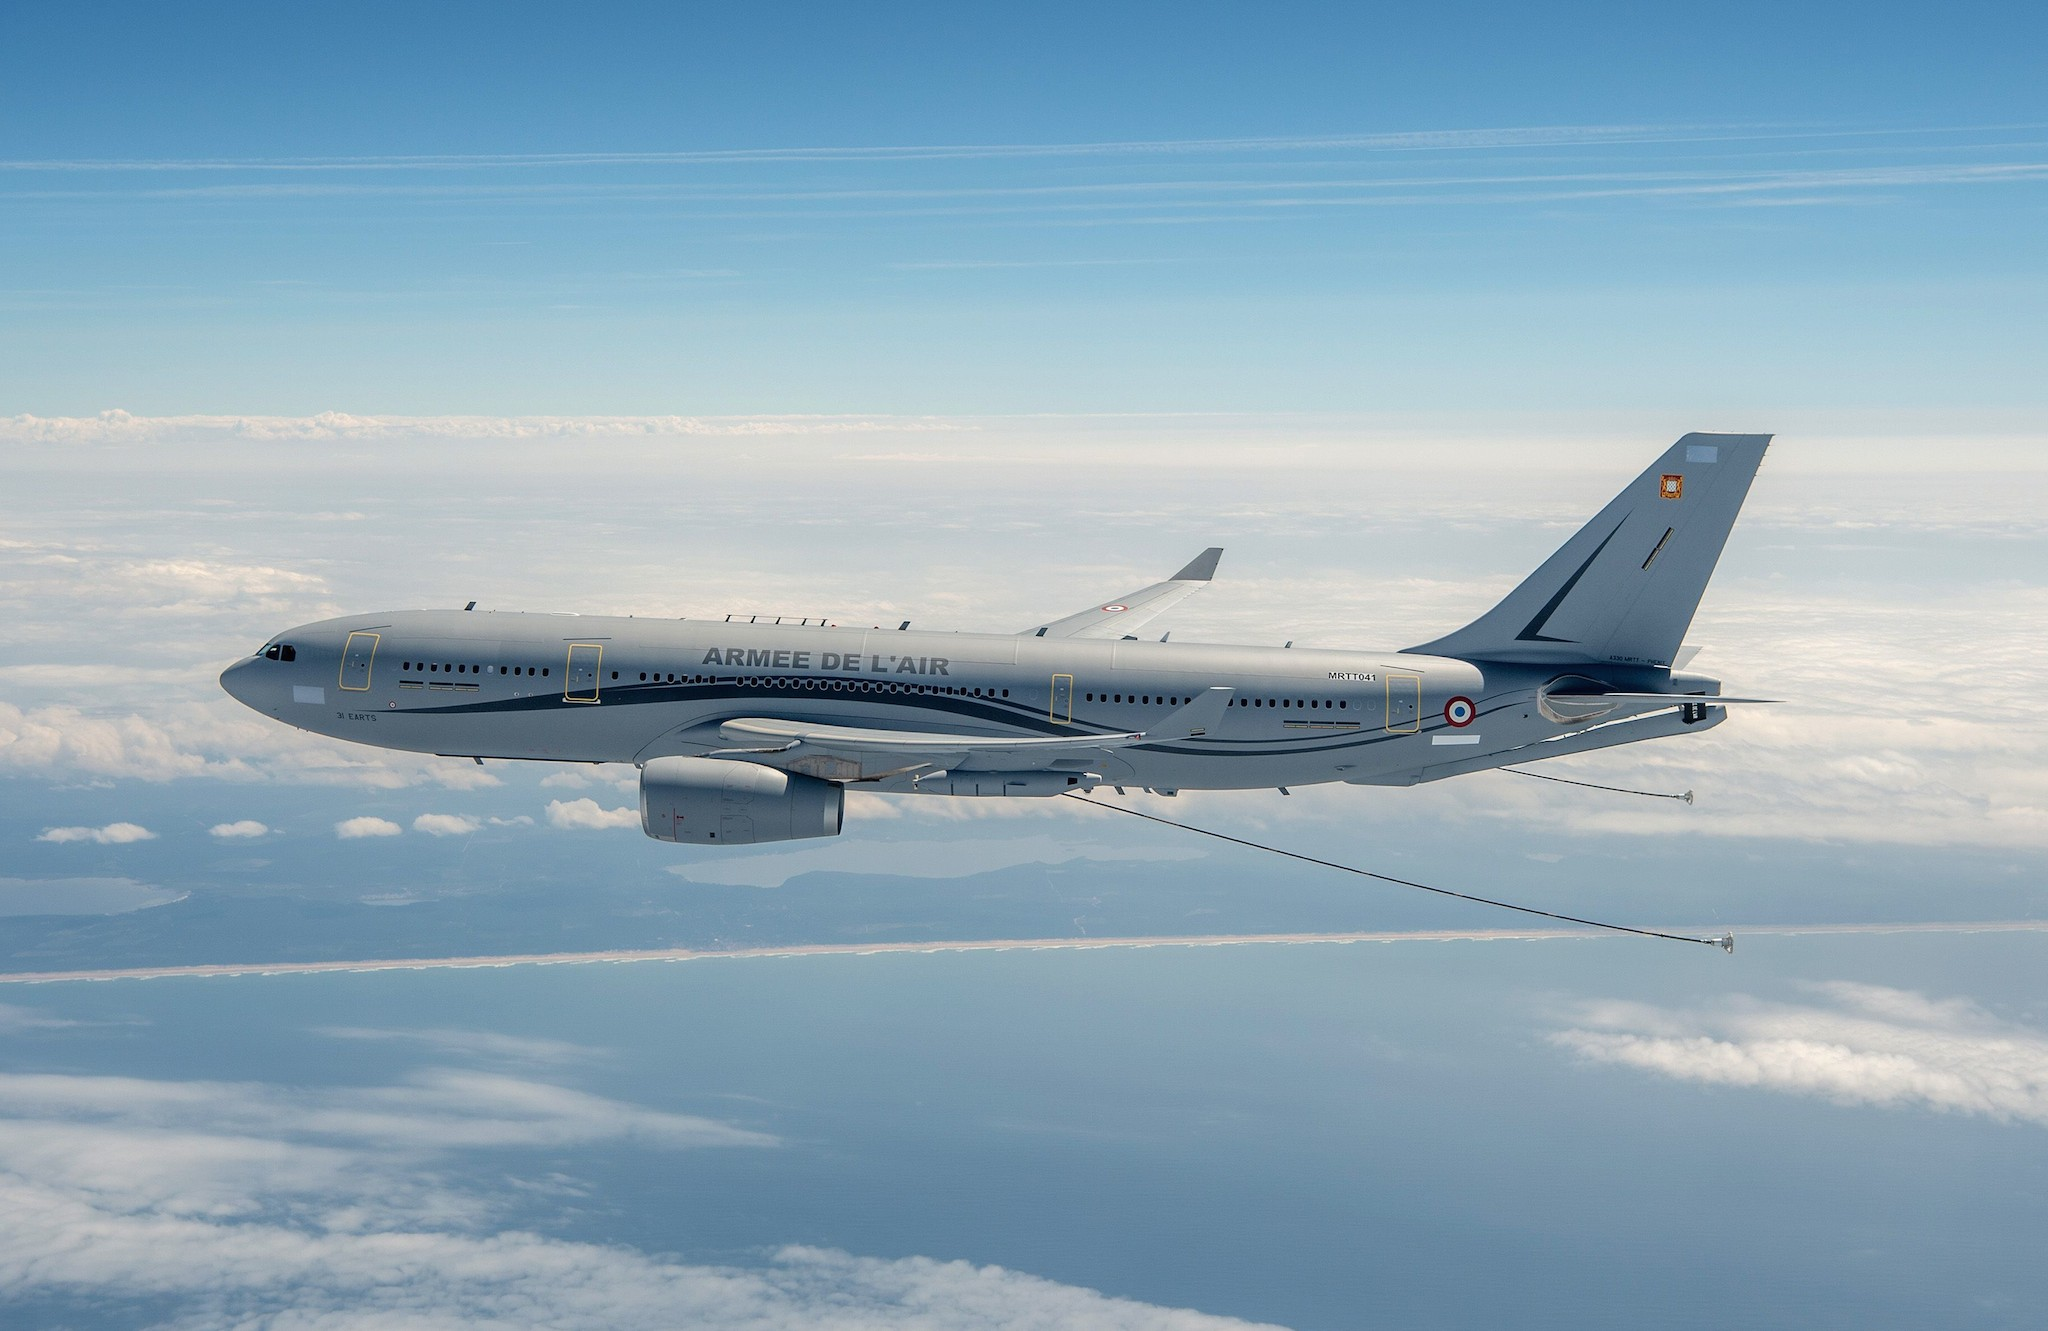 A330 MRTT Armée de l'Air française